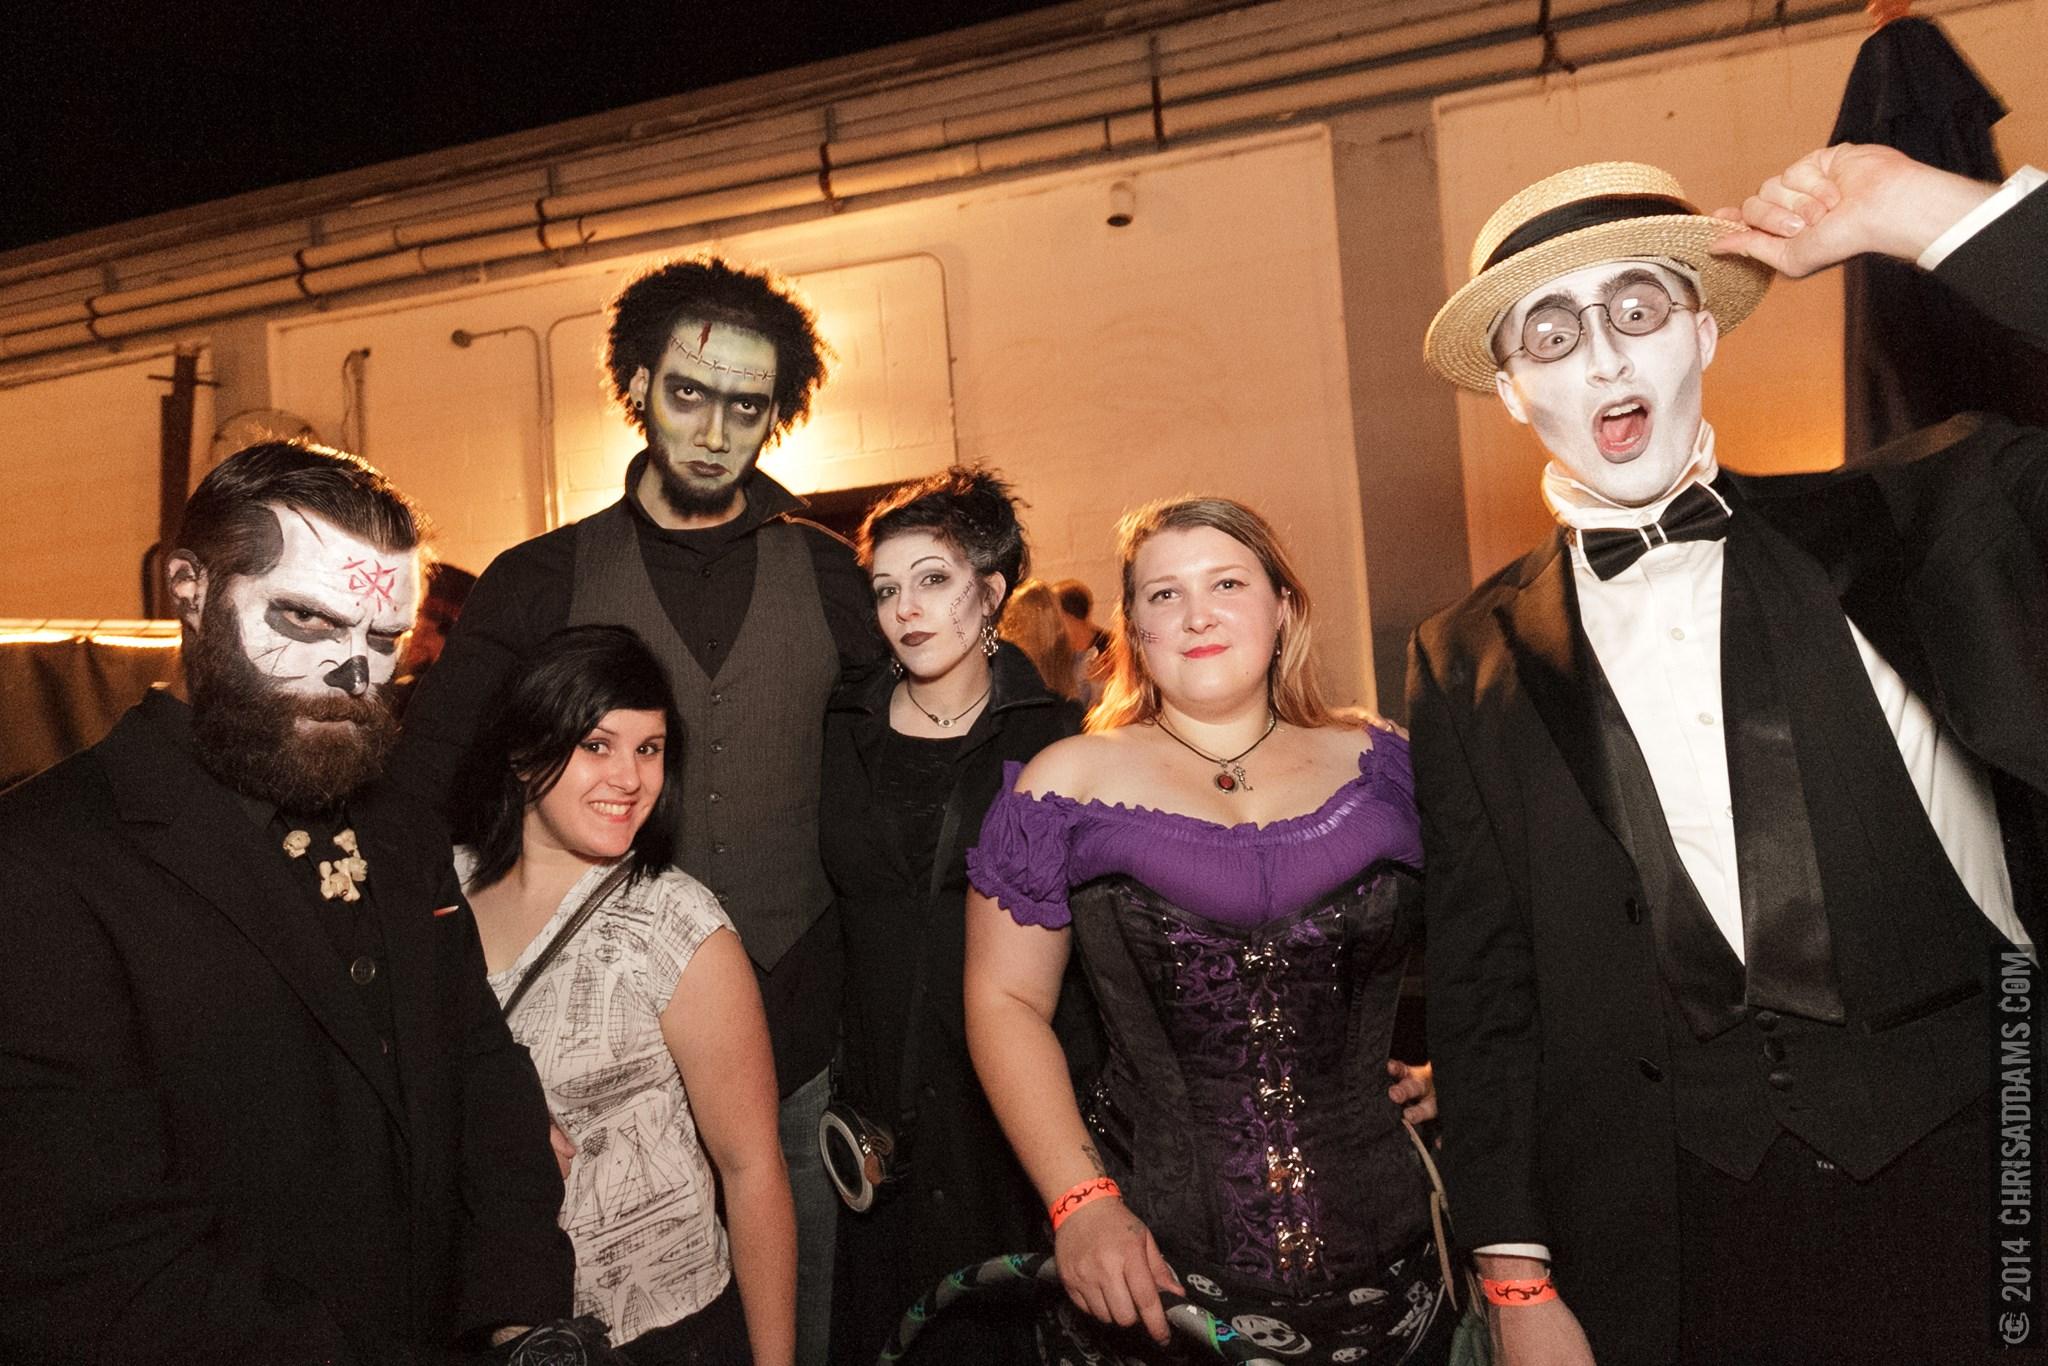 TheHavenClub-Goth-Industrial-Dance-Alternative-Northampton-MA (27).jpg